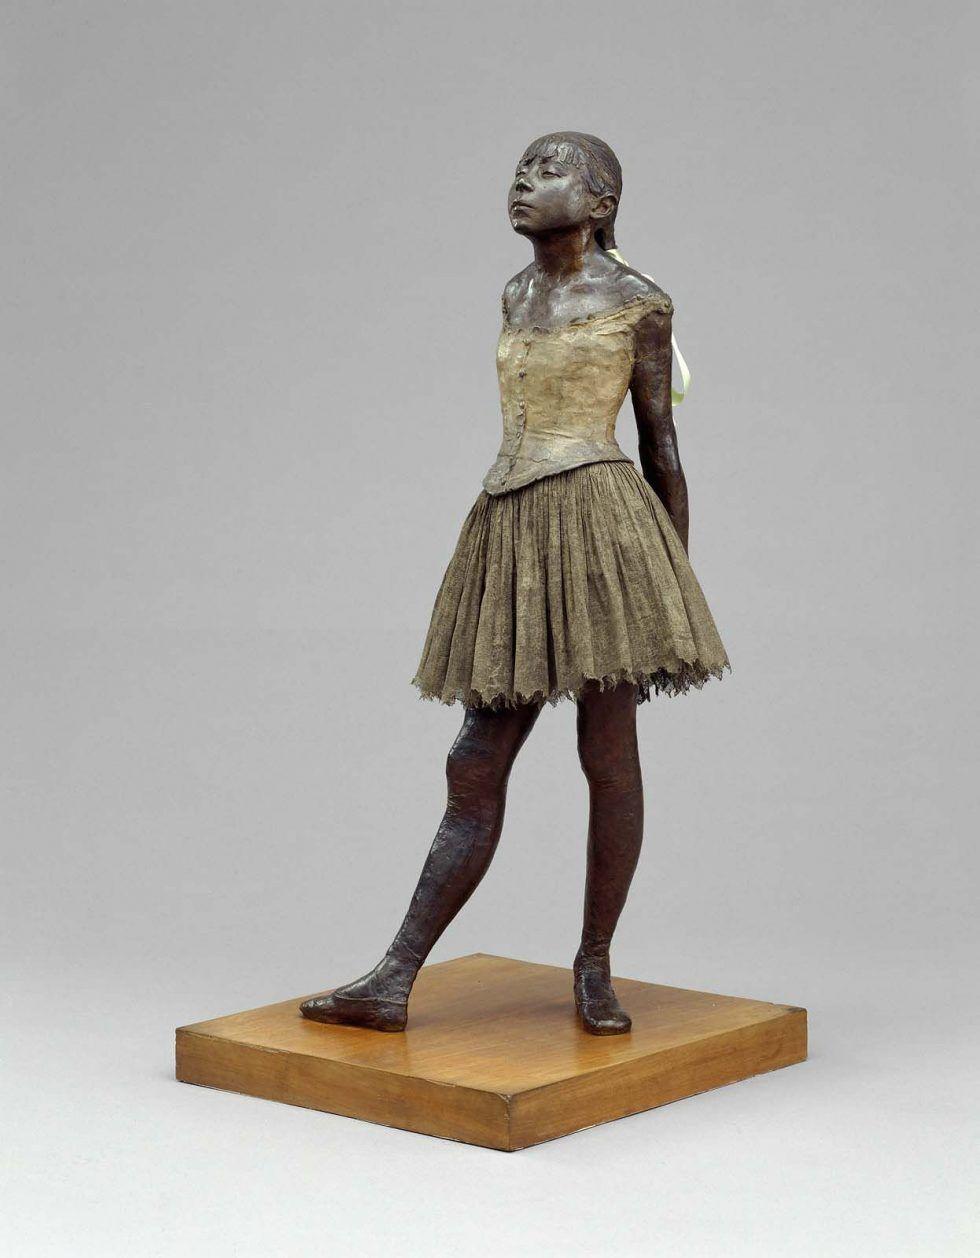 Edgar Degas, Petite danseuse de quatroze ans [Kleine vierzehnjährige Tänzerin], Original aus Wachs 1880/81, Abguss um 1932/36, Bronze, teilweise bemalt, Baumwoll-Tutu und Seidenband, 98 cm (Stiftung Sammlung E. G. Bührle, Zürich)